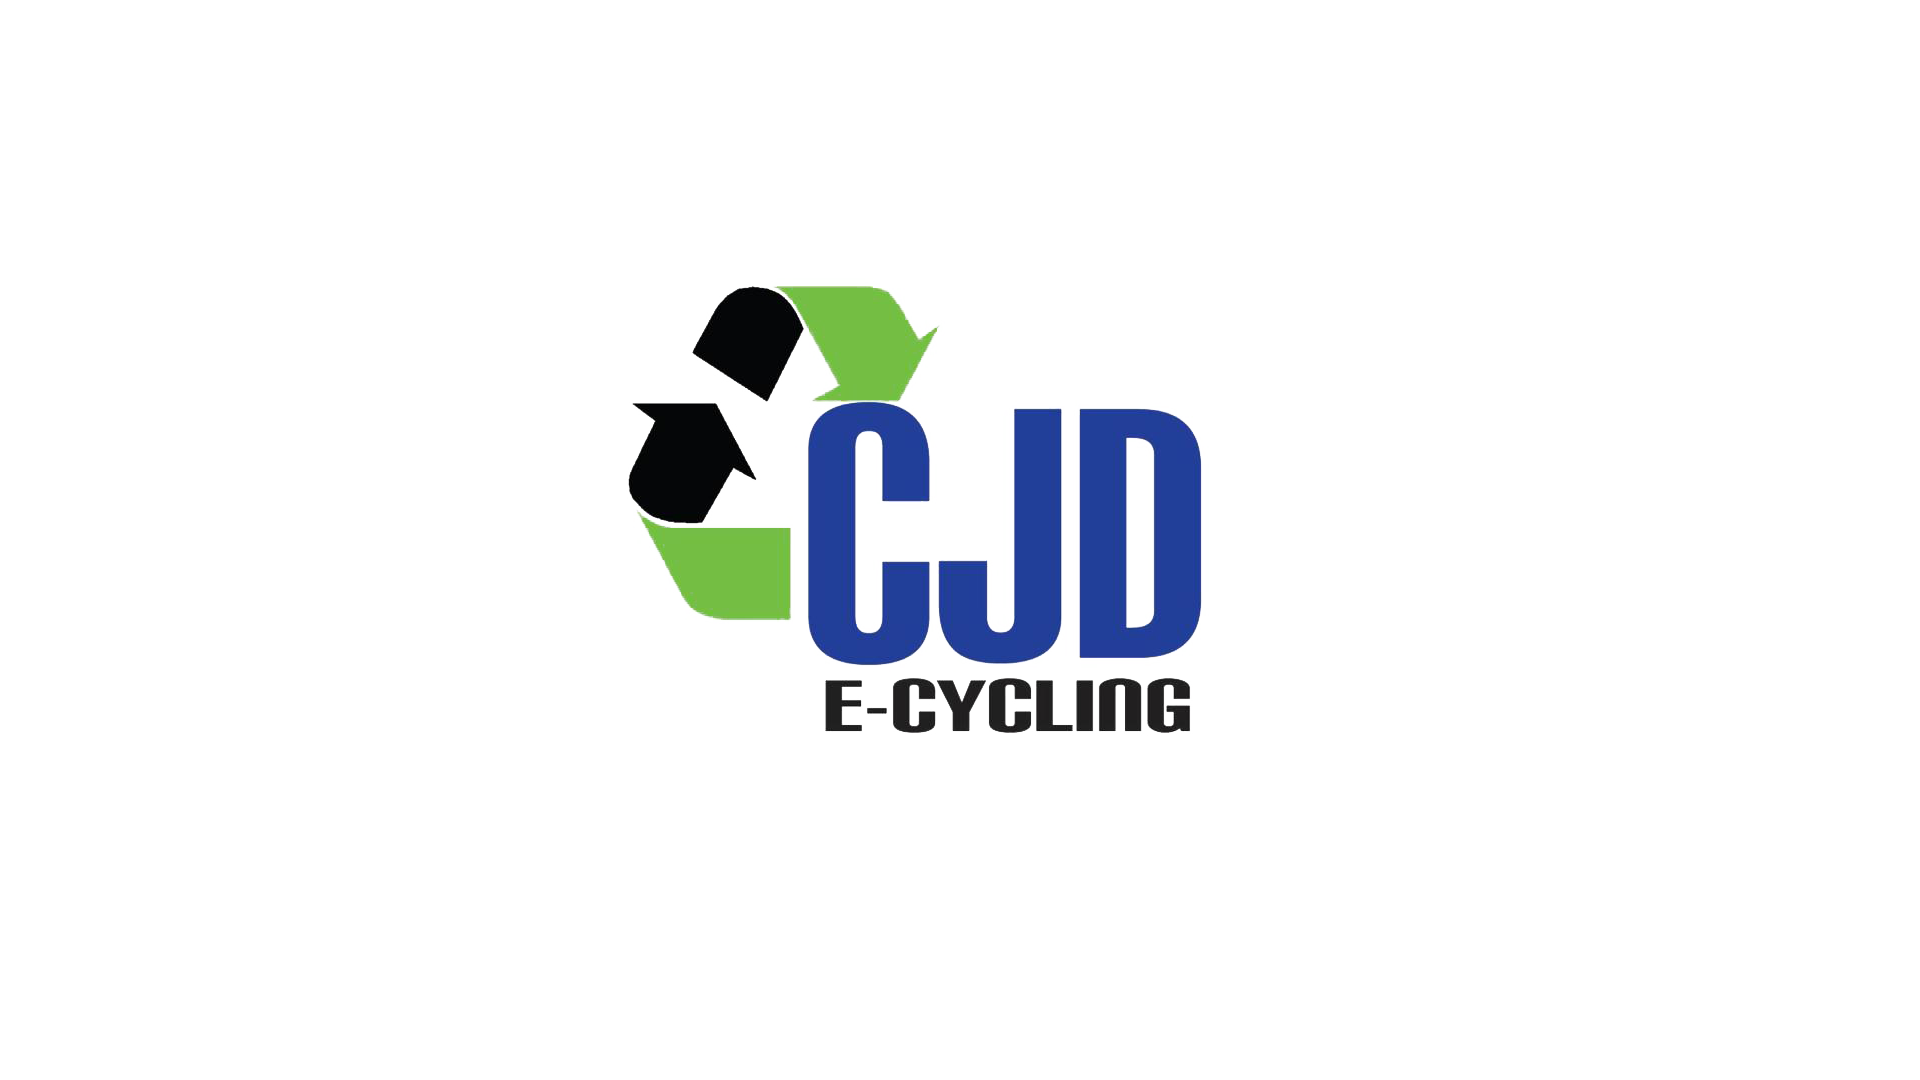 CJD E-CYCLING